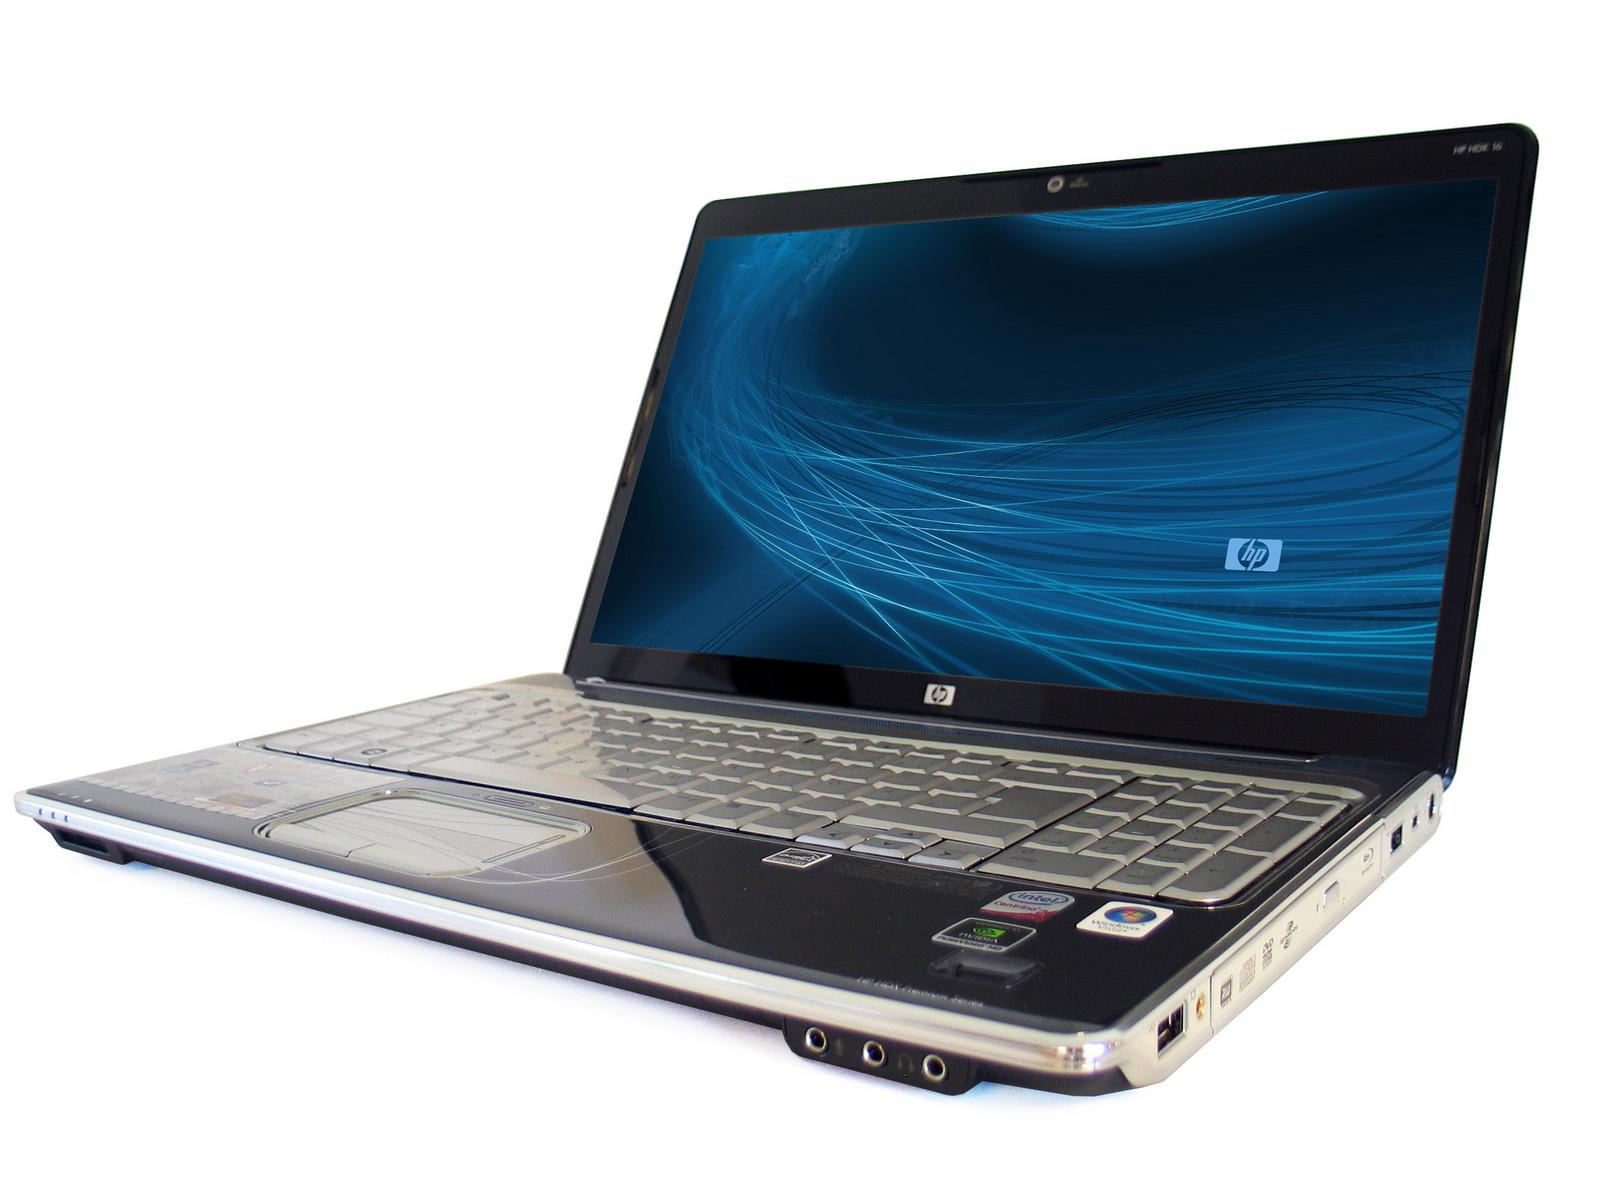 HP Pavilion HDX16t - Notebookcheck.net External Reviews